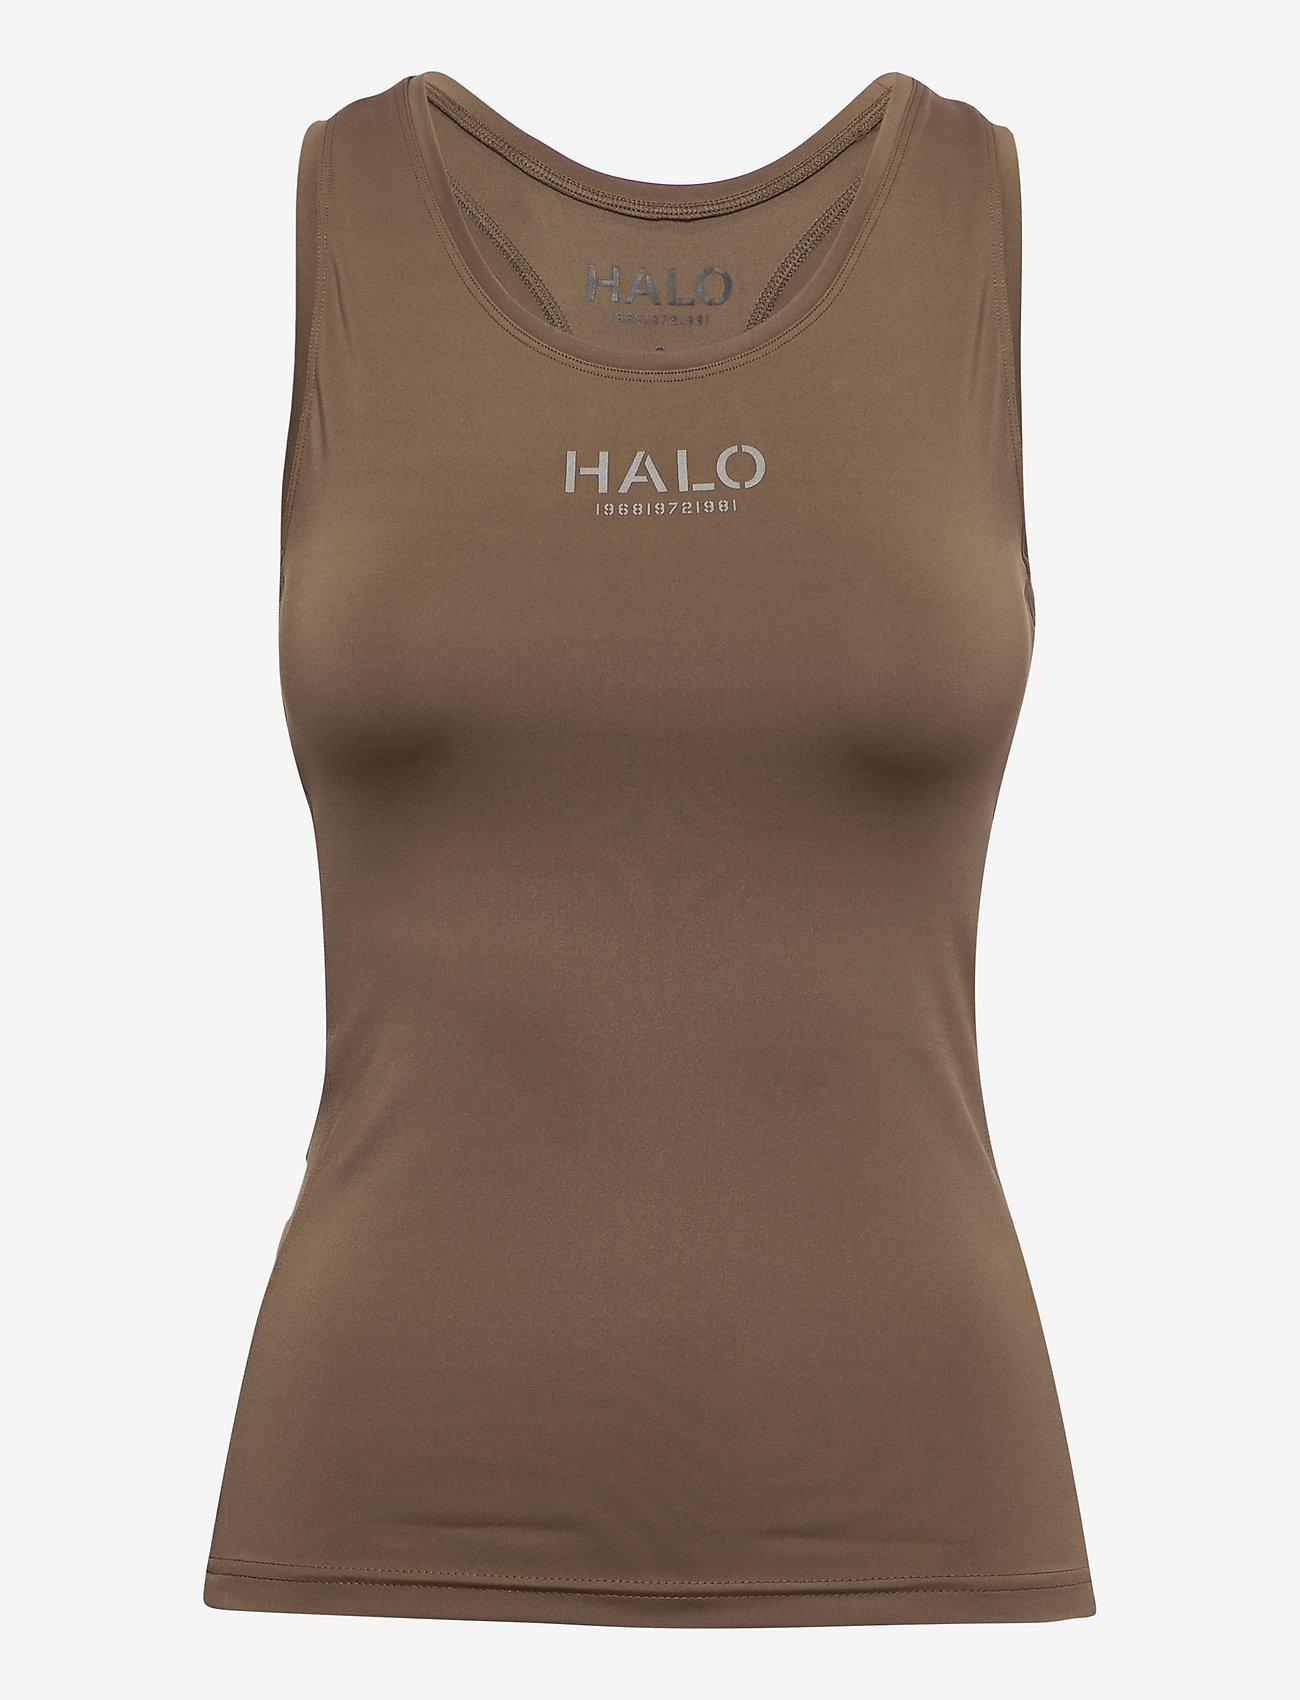 HALO - HALO WOMENS RACERBACK TANK - sleeveless tops - vintage brown - 0